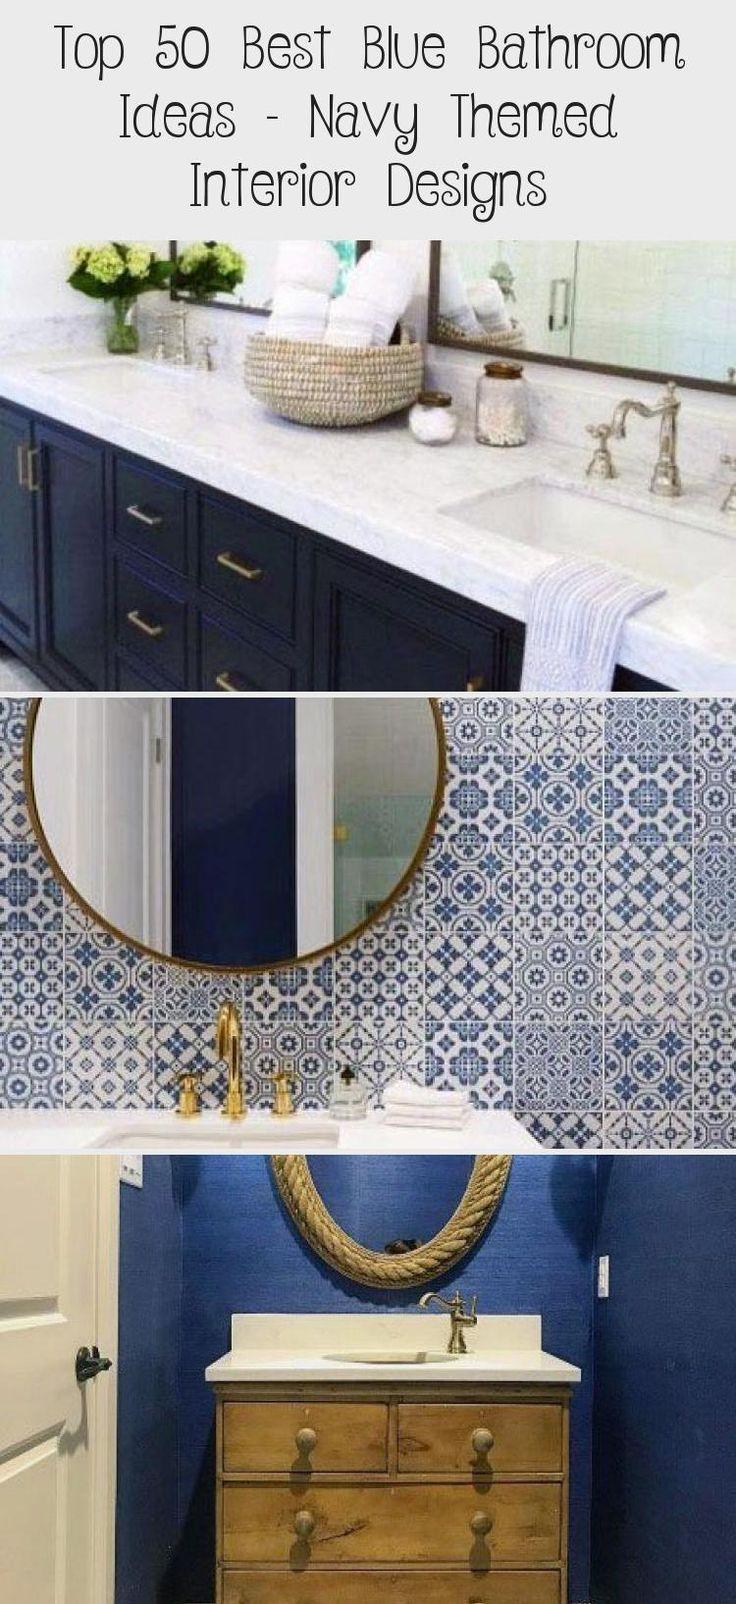 top 50 best blue bathroom ideas  navy themed interior